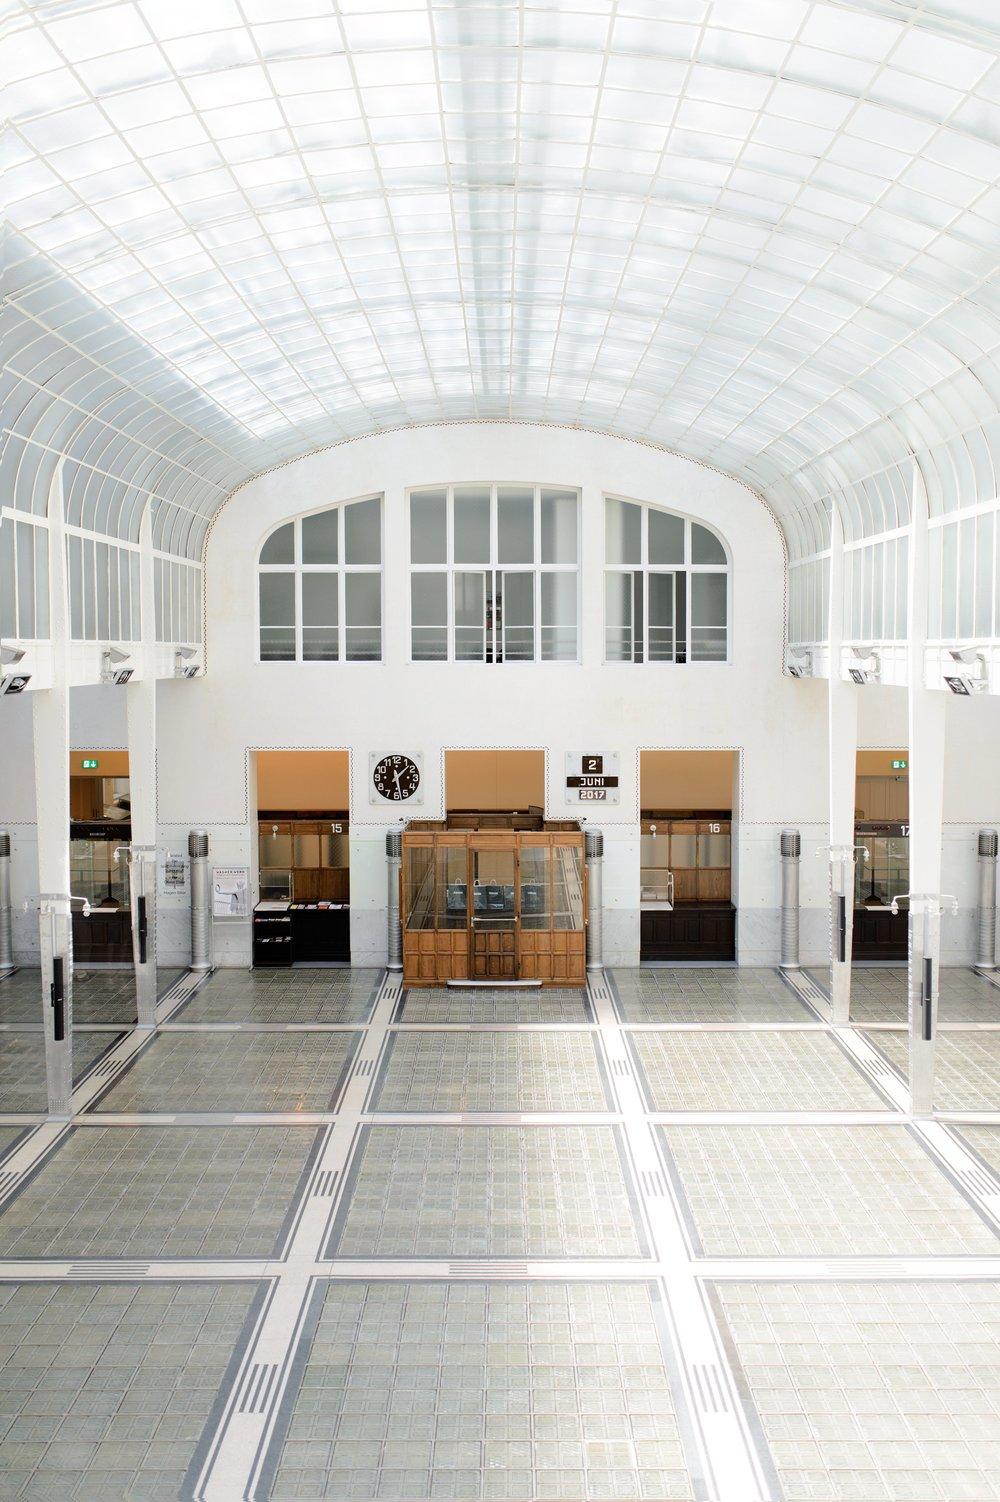 Postal_Savings_Bank_Large_Banking_Hall_c_SIGNA_.original-2.jpg